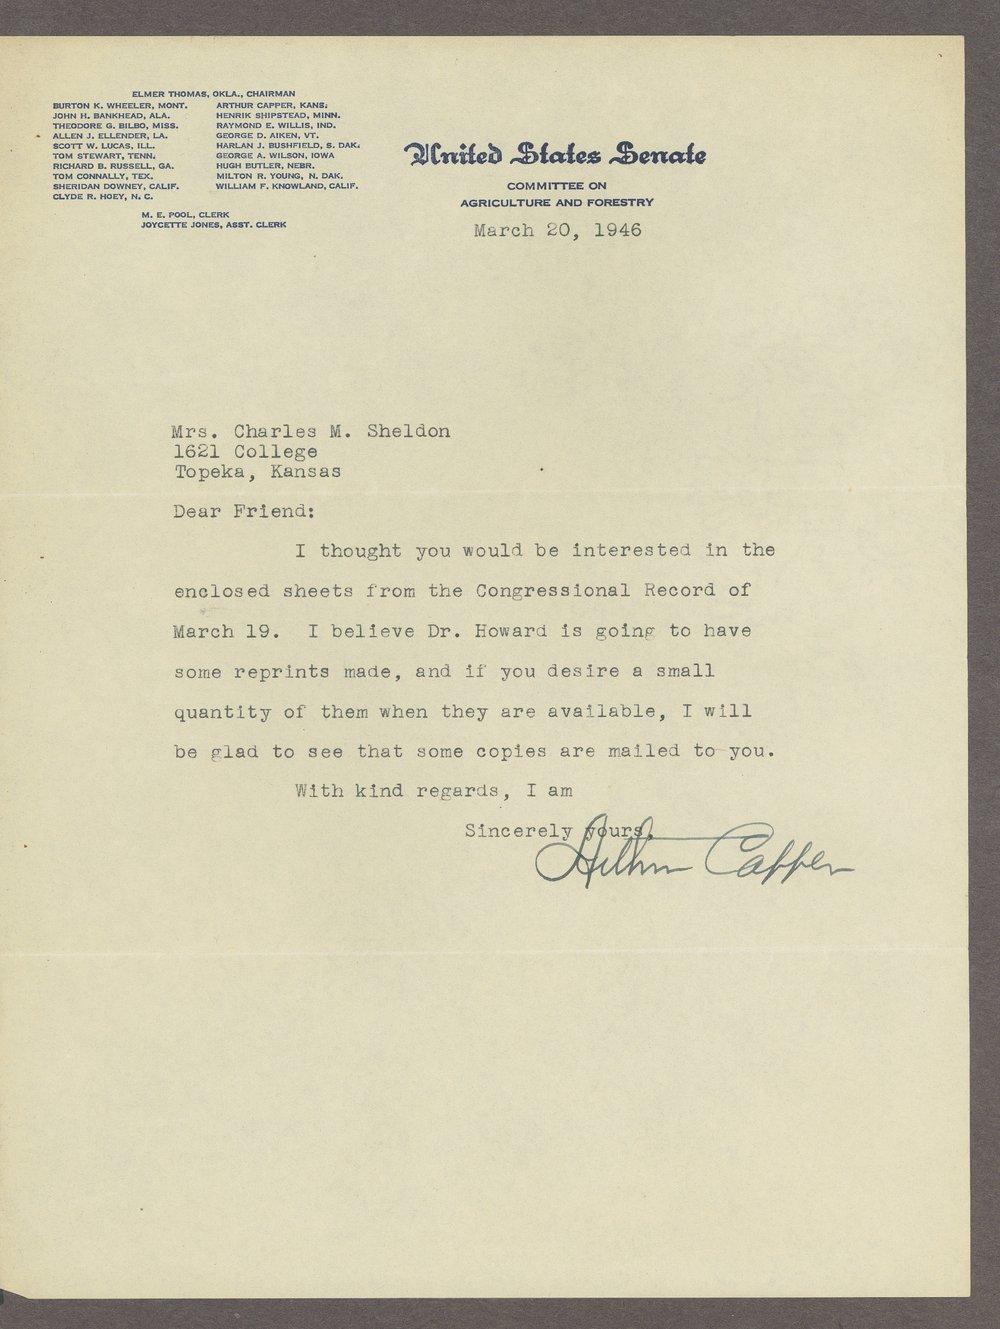 Mary M. Sheldon correspondence - 12